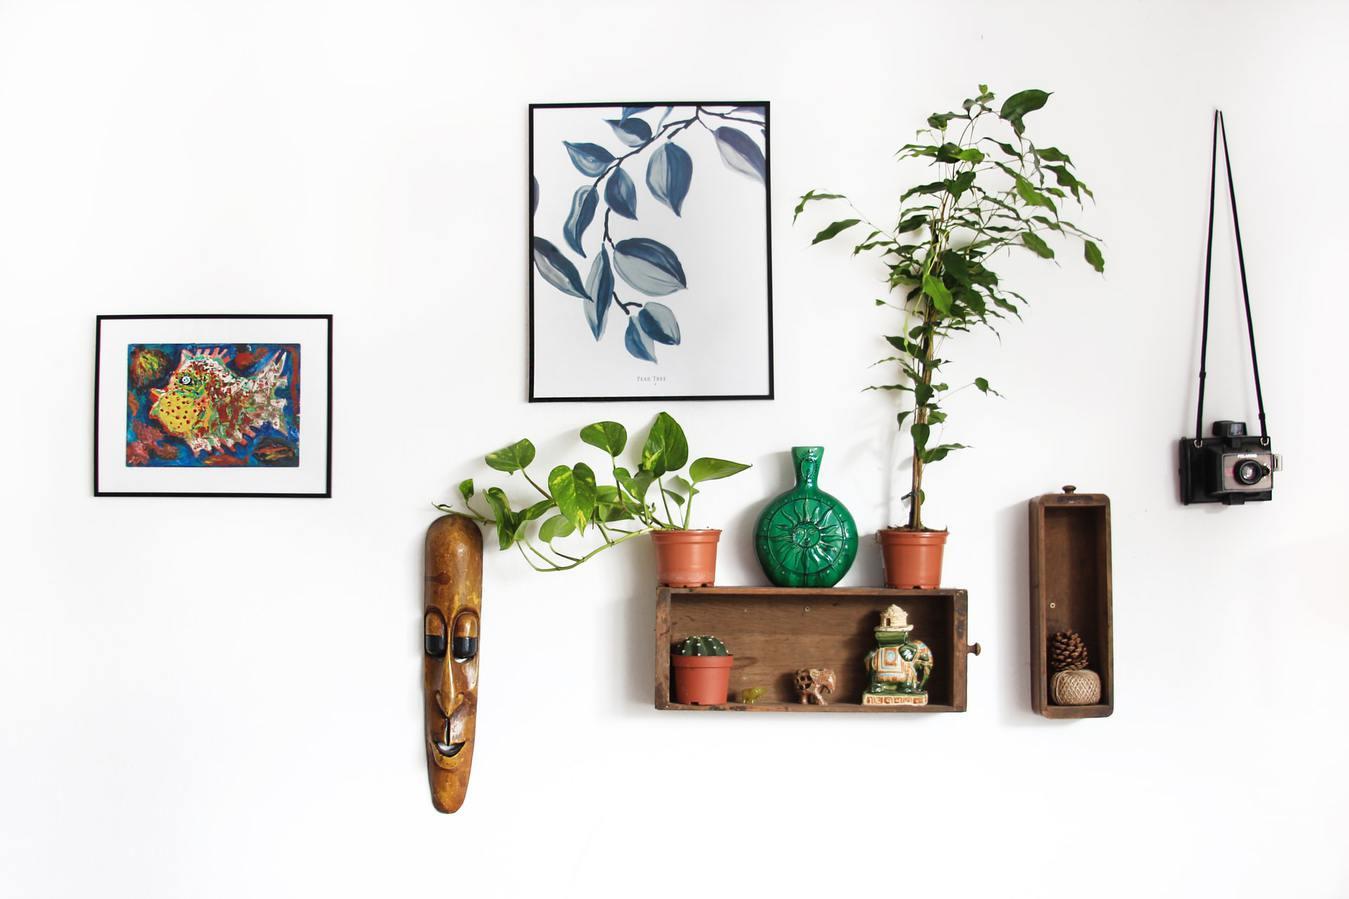 Items on a Shelf and Wall, Home Decor